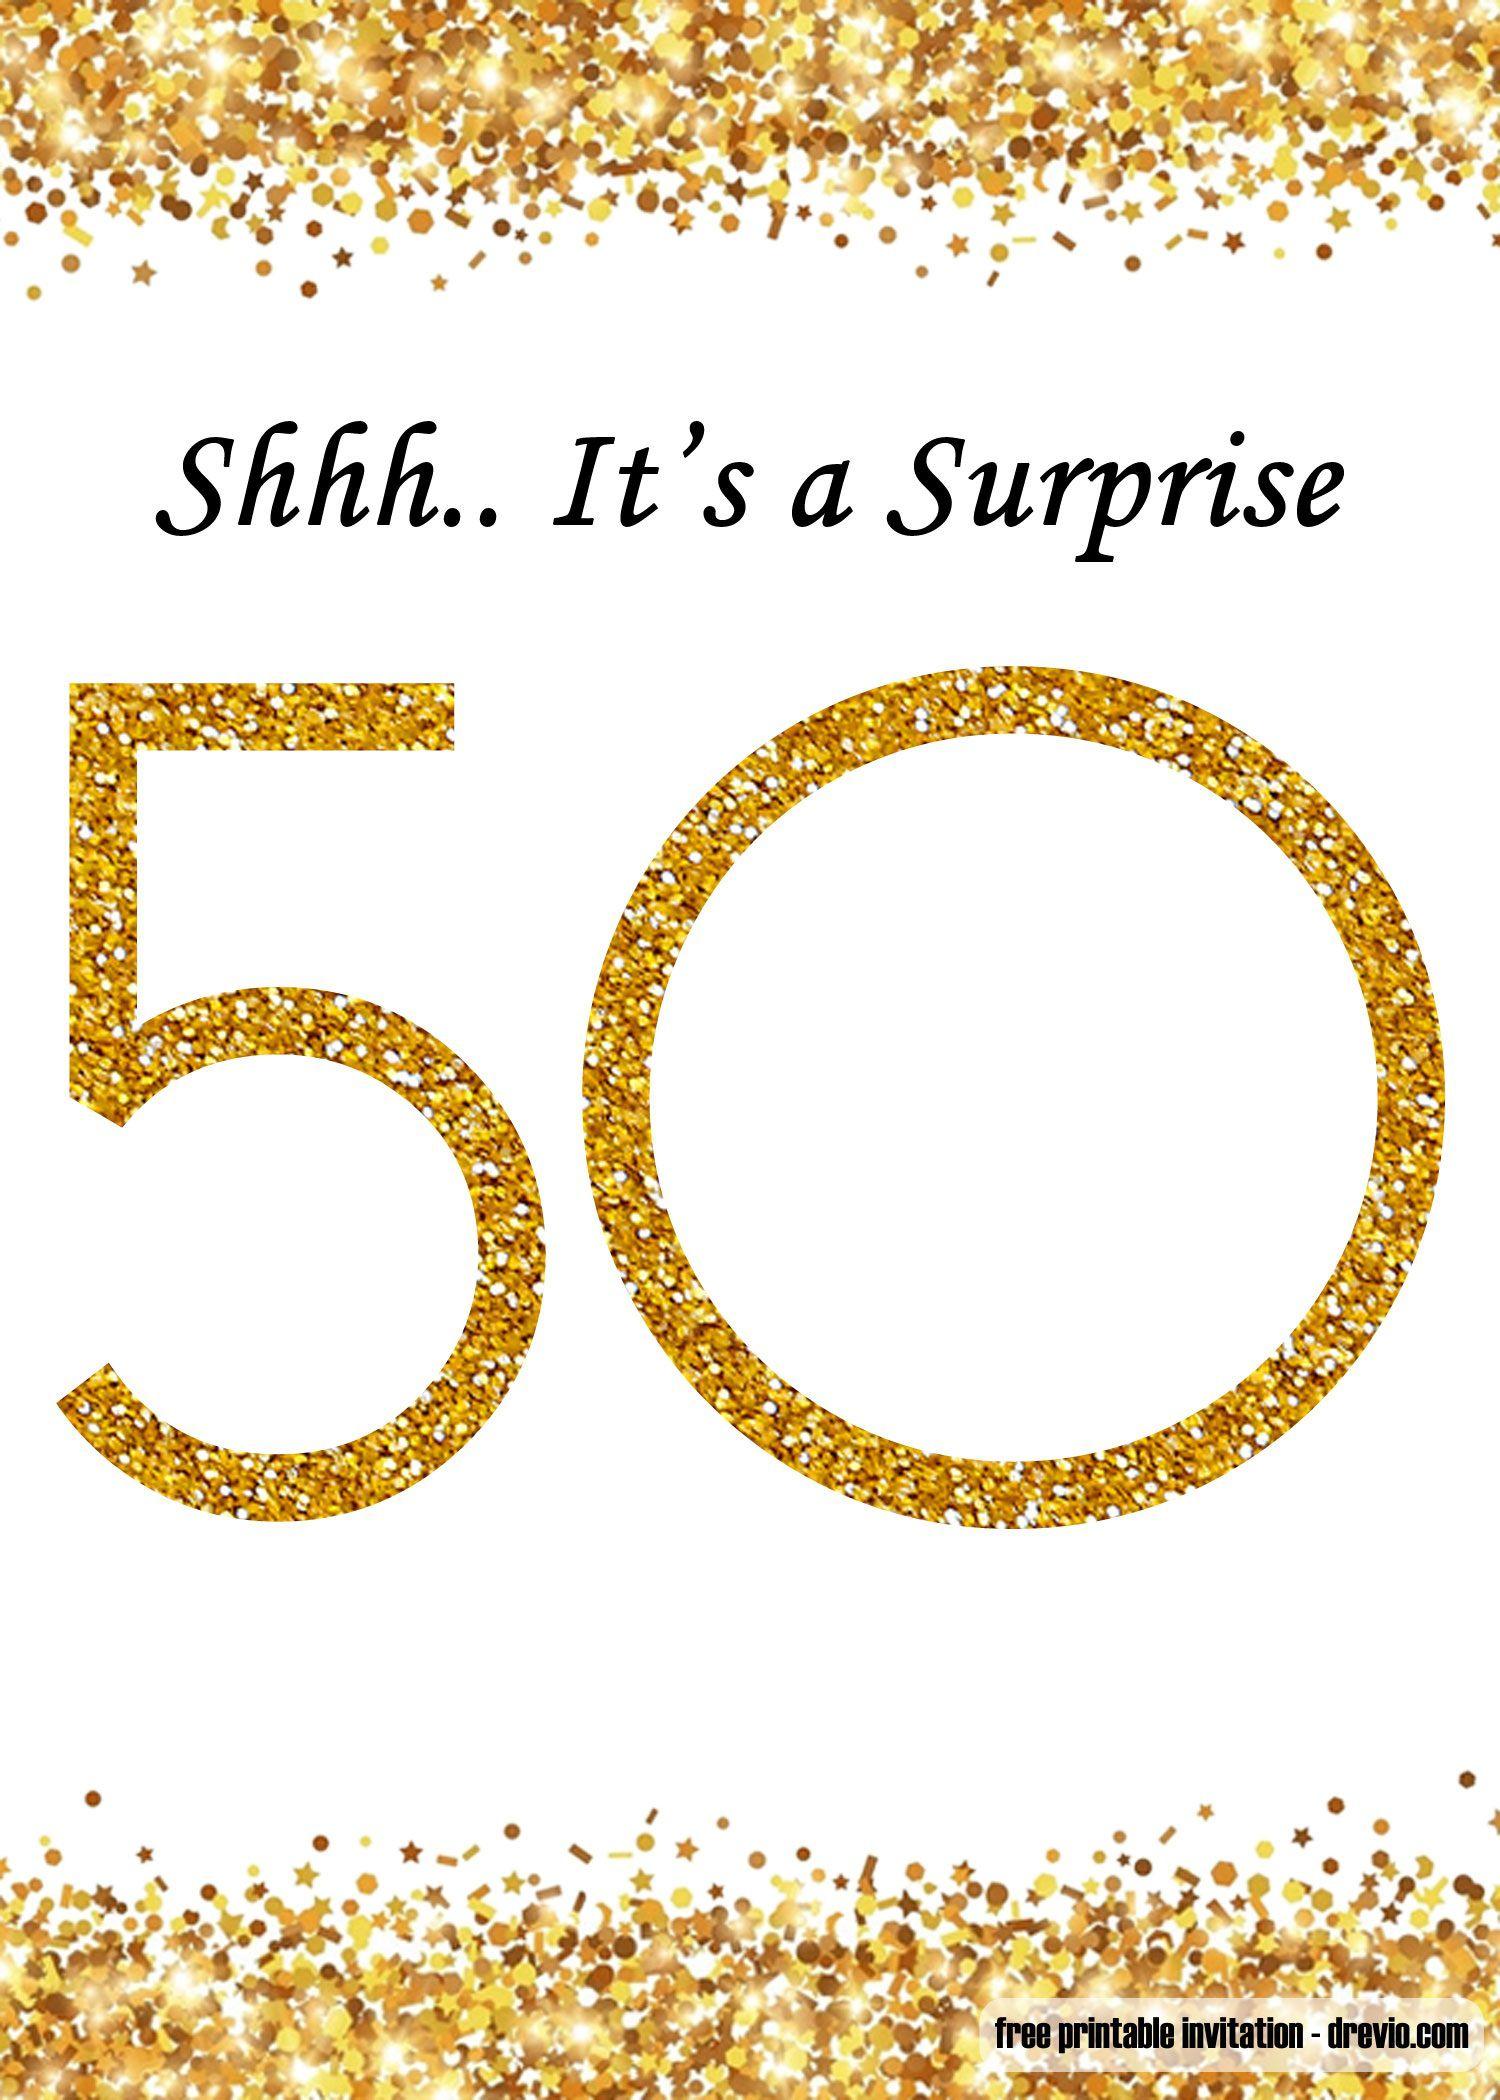 008 Unique Surprise 50th Birthday Invitation Template Word Free Photo Full